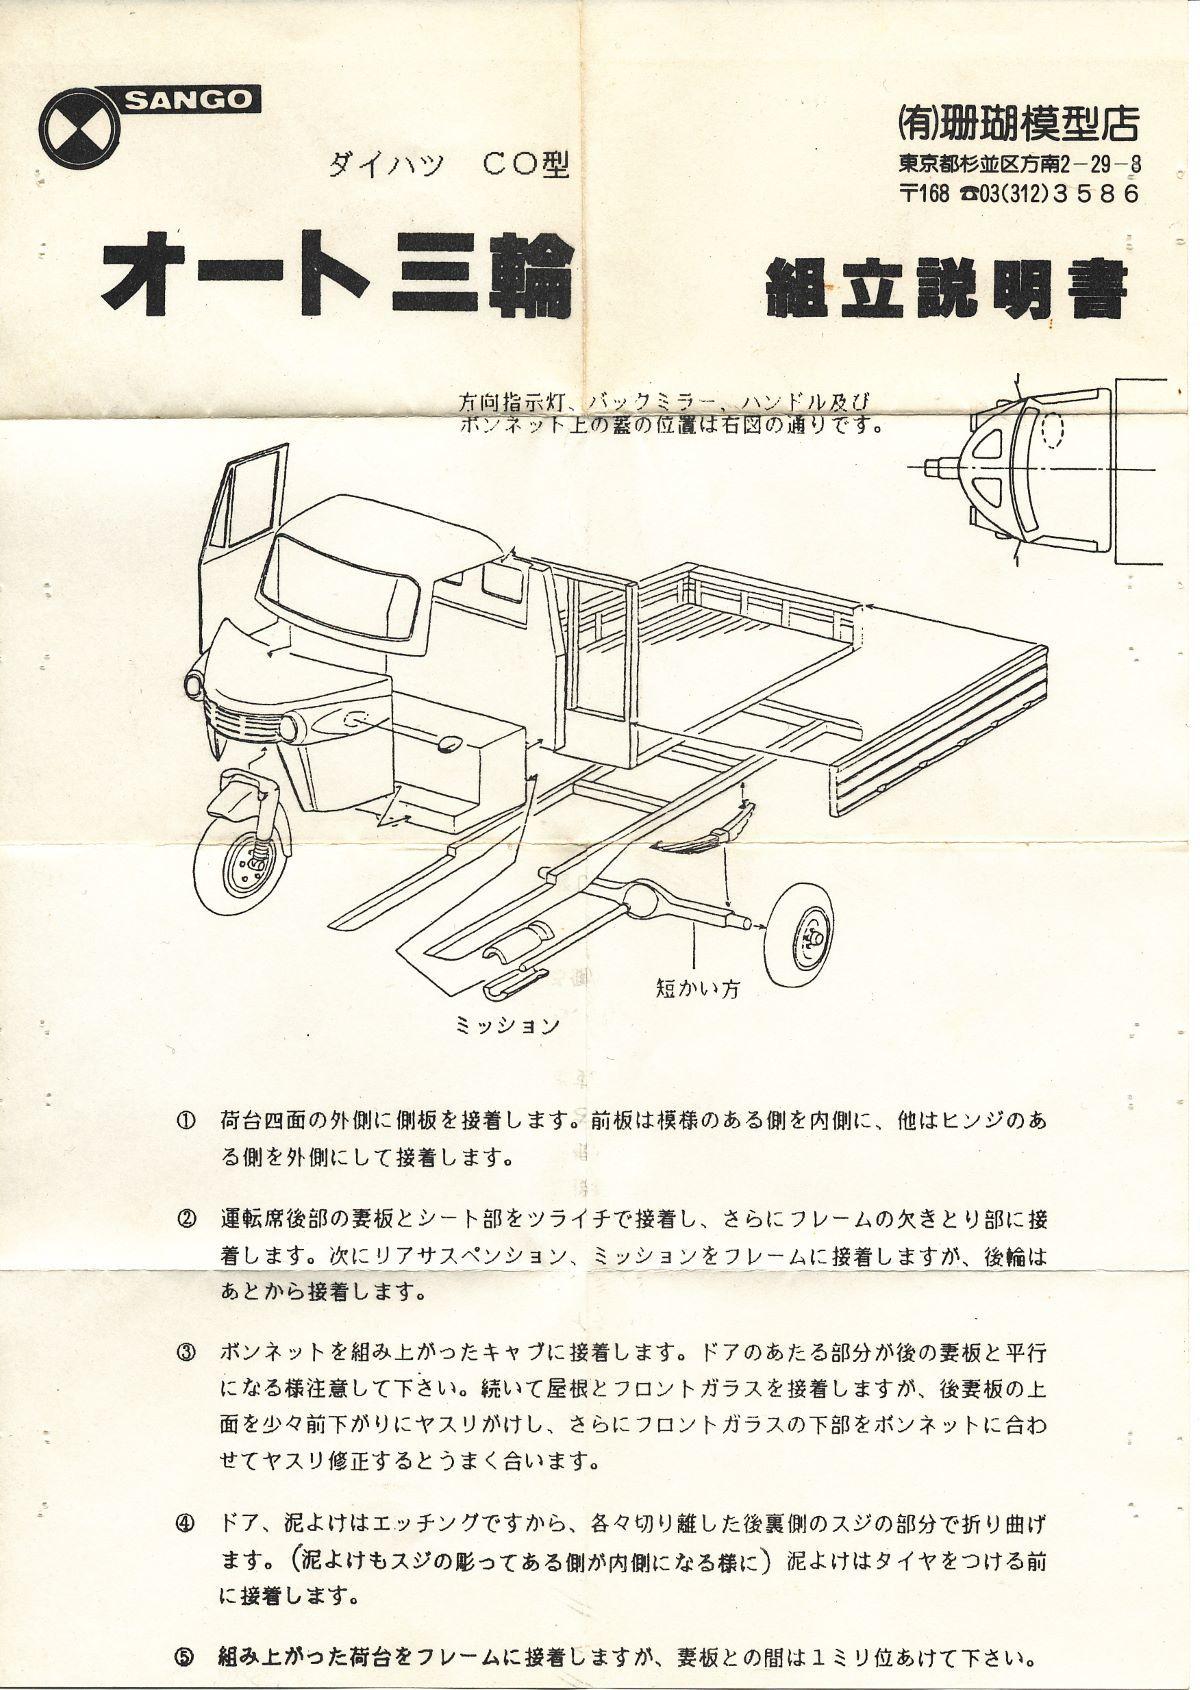 a16_sango-ai_daihatsu-CO.jpg